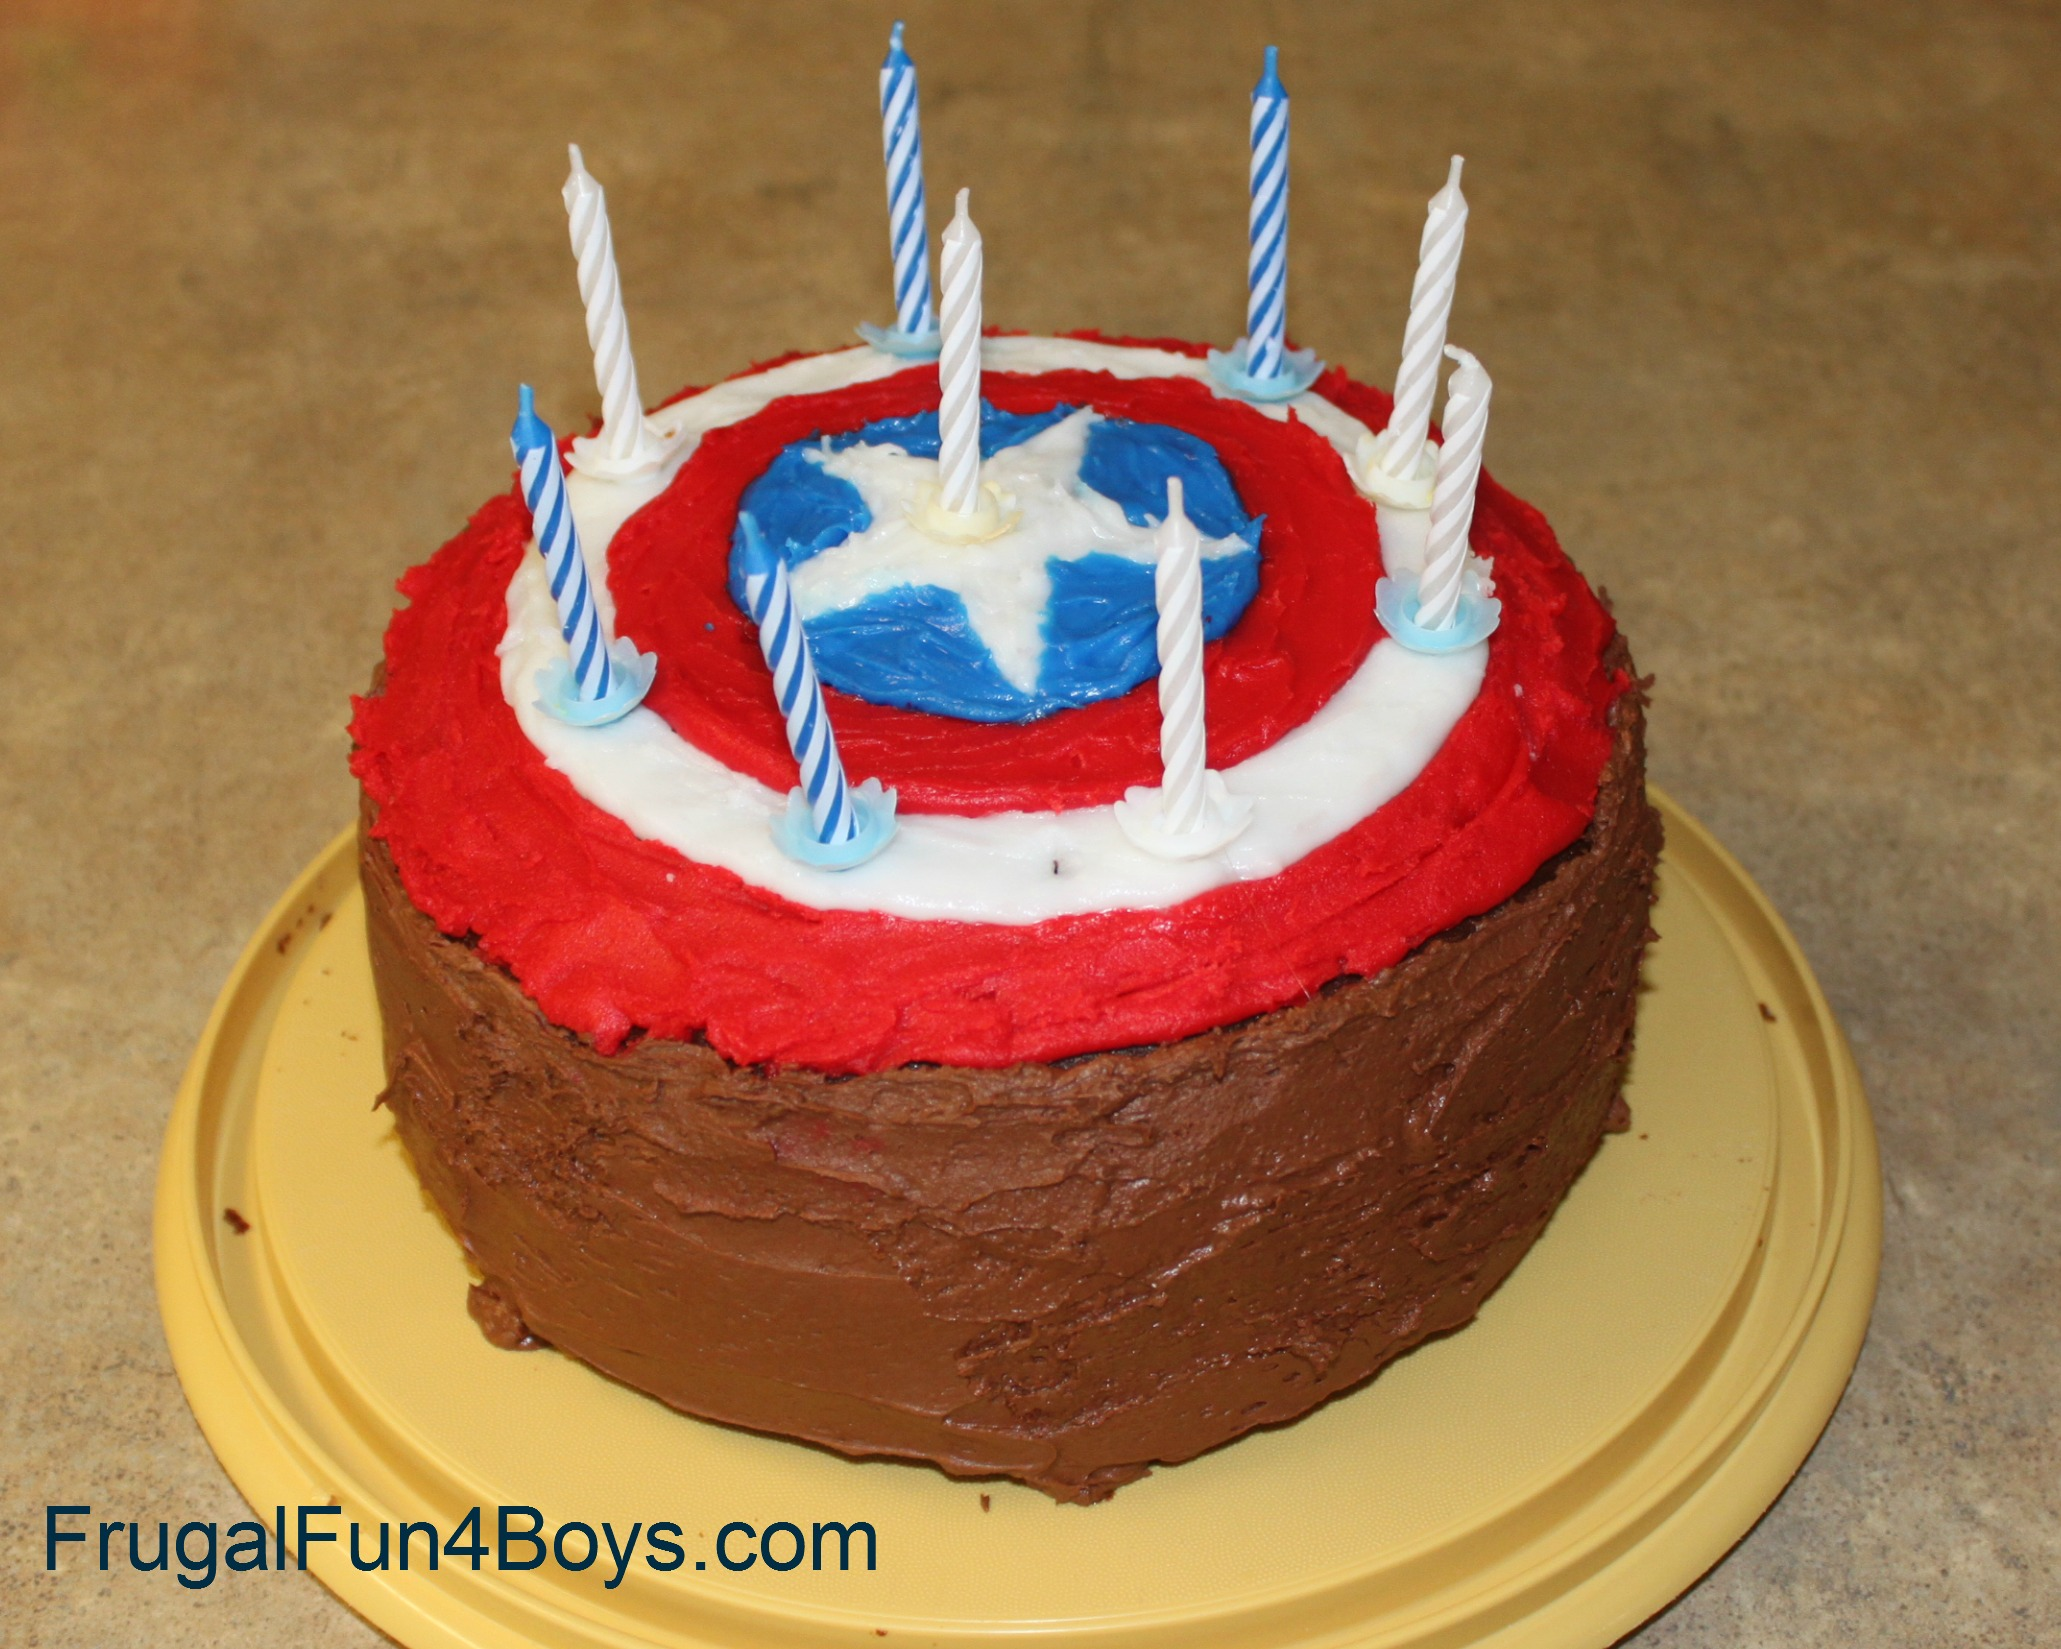 http://frugalfun4boys.com/wp-content/uploads/2012/07/captain-america-cake.jpg